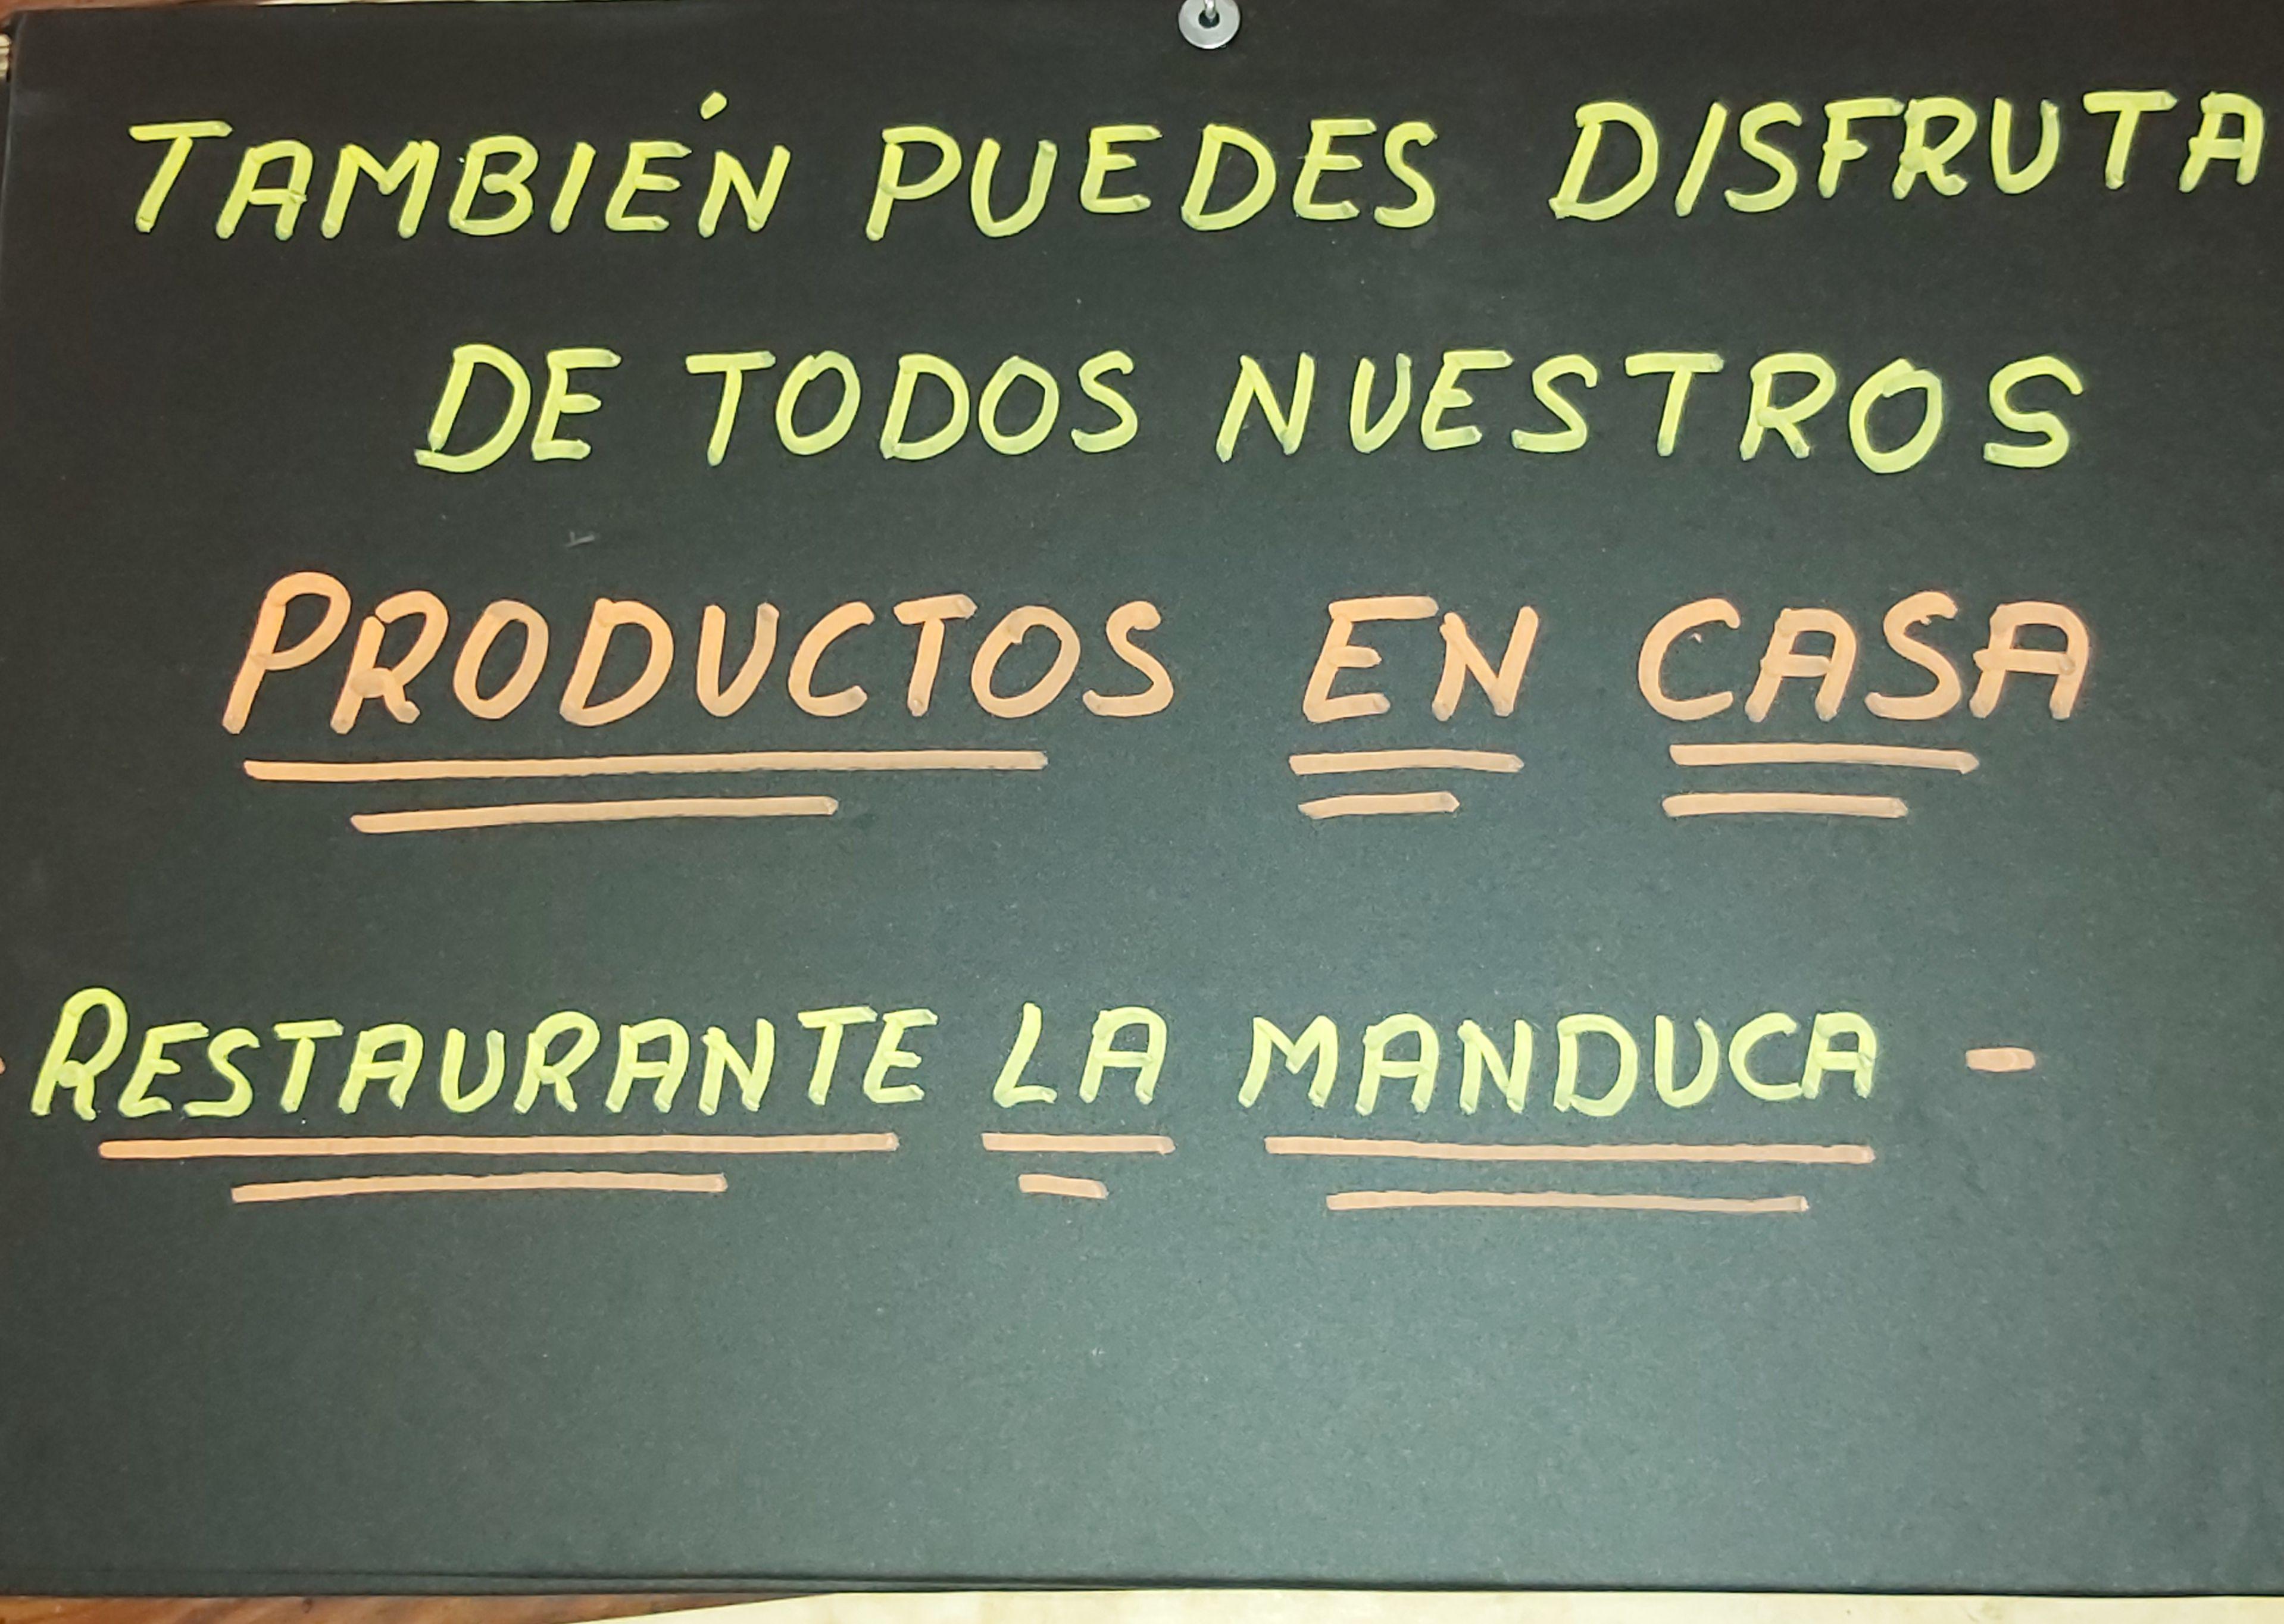 Comida para llevar - Restaurante La Manduca en Guadalajara